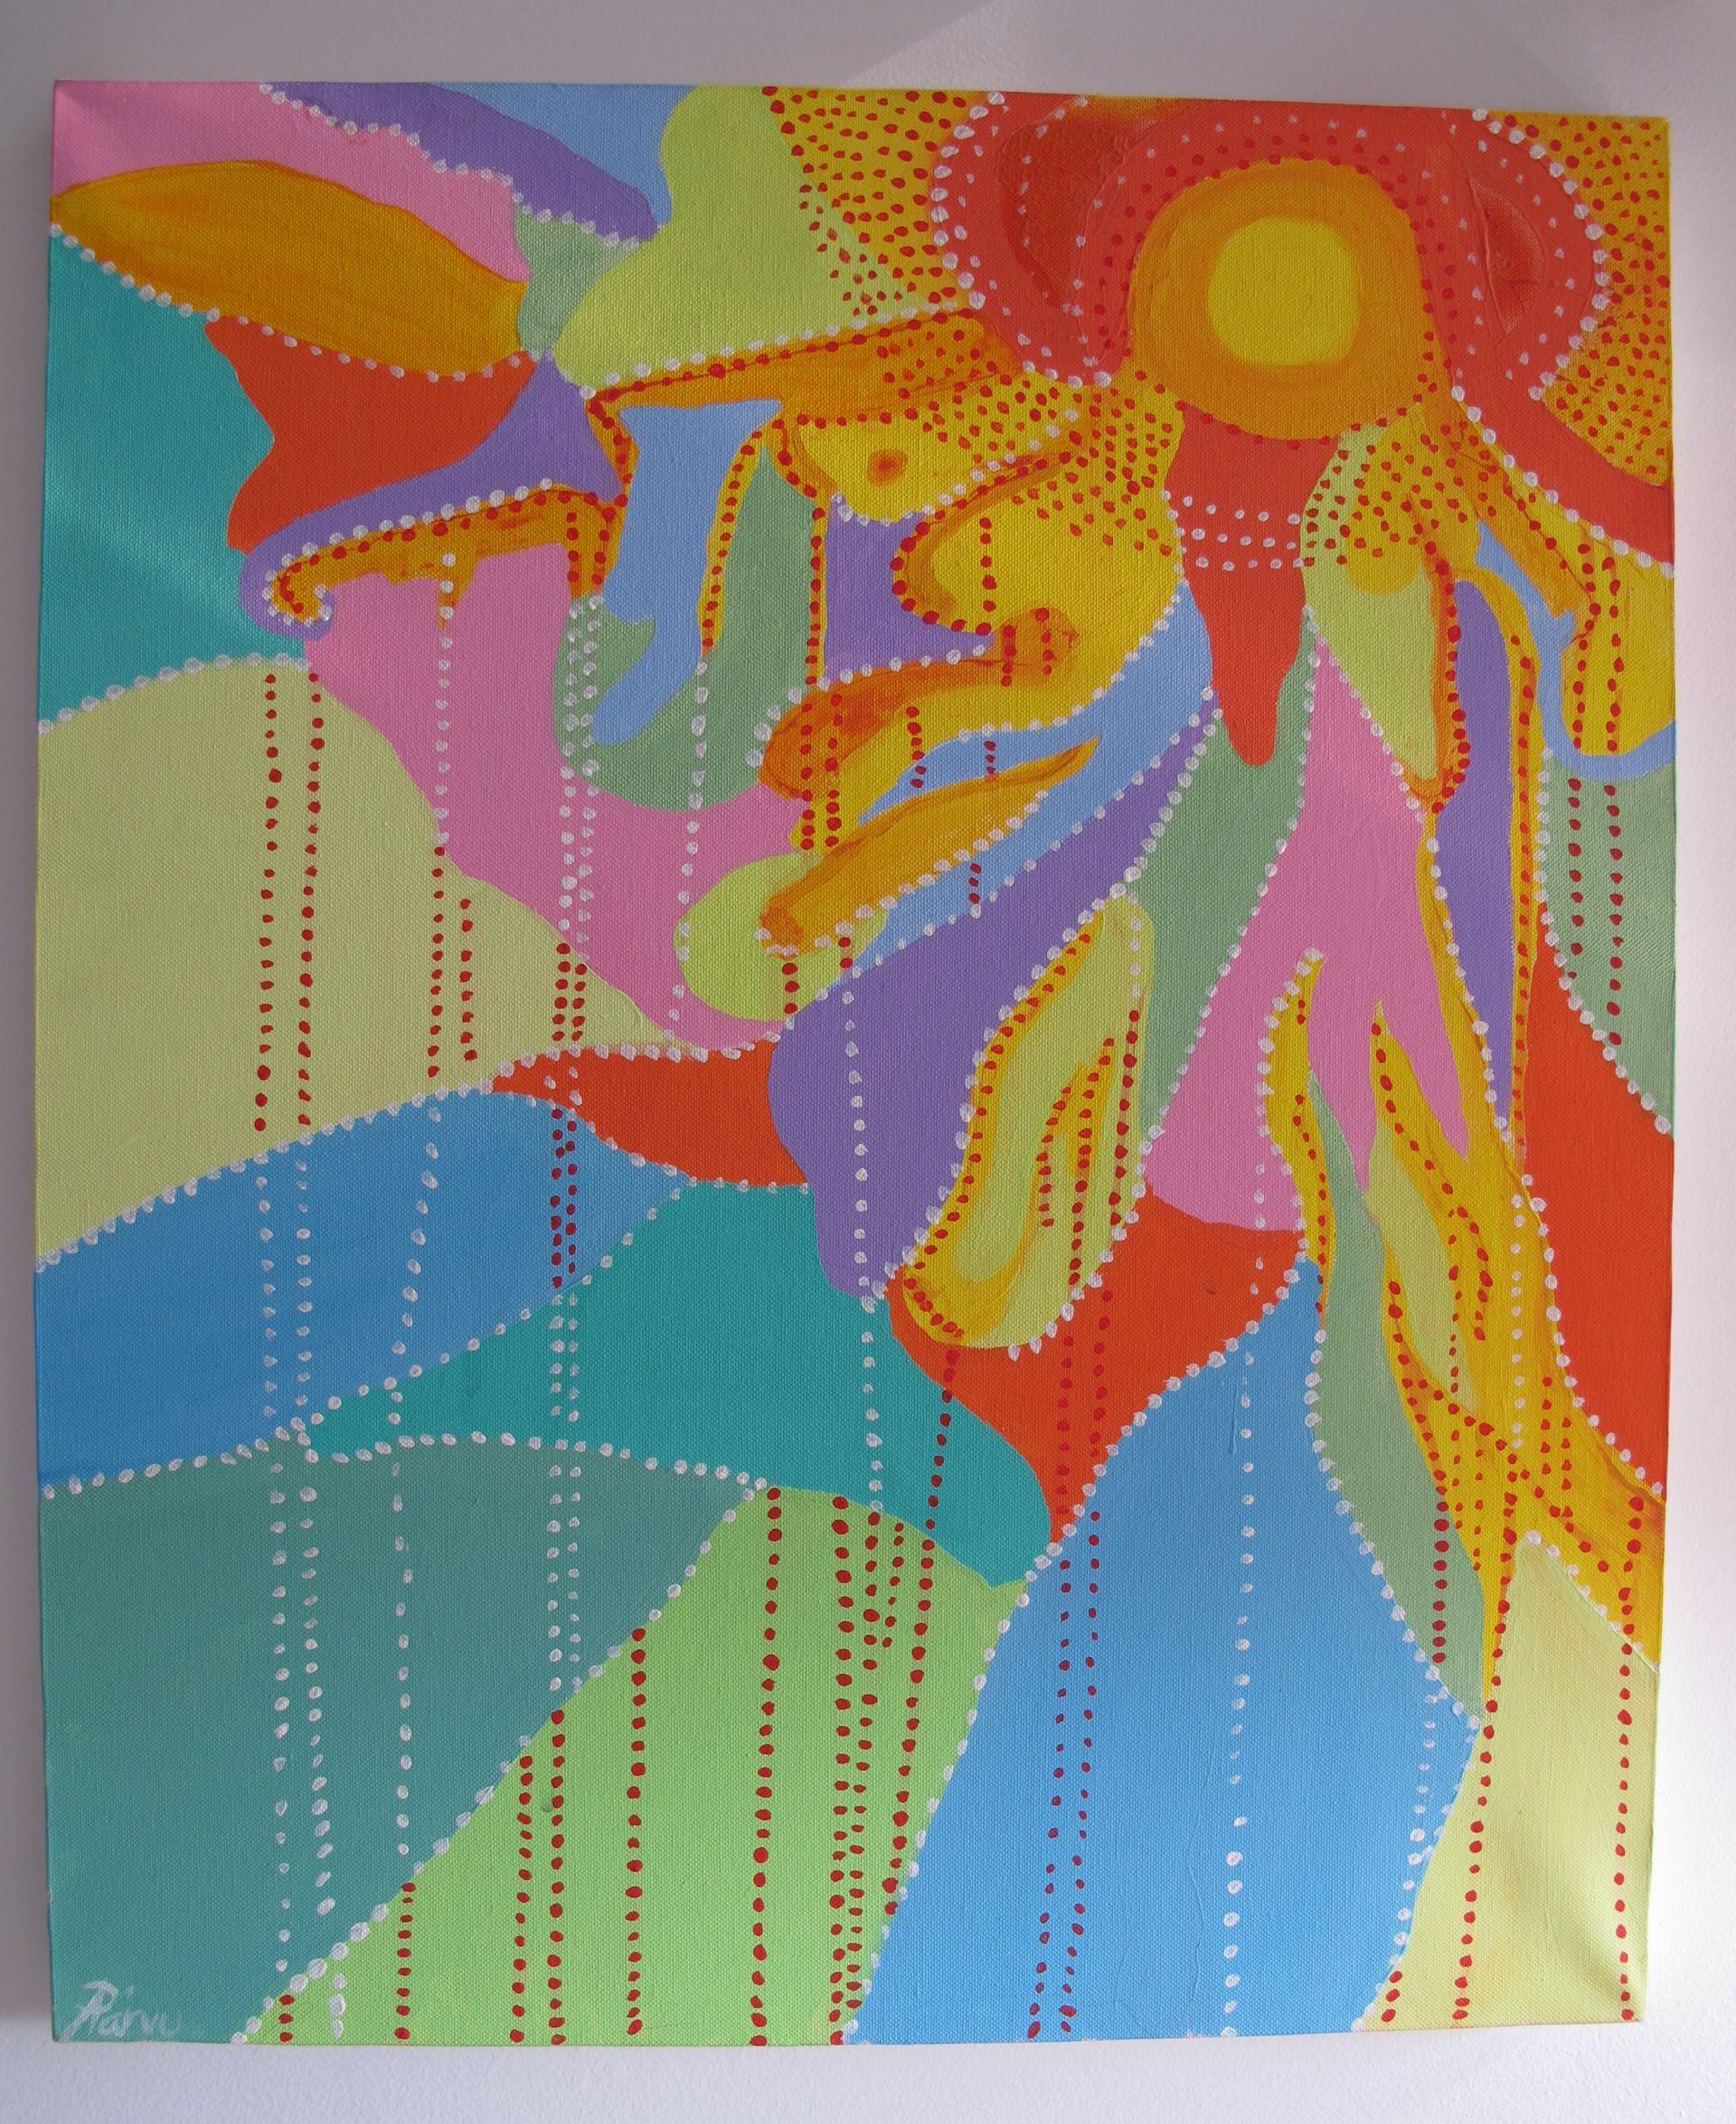 Picaturi de energie, 2009, tablou de Adela Parvu